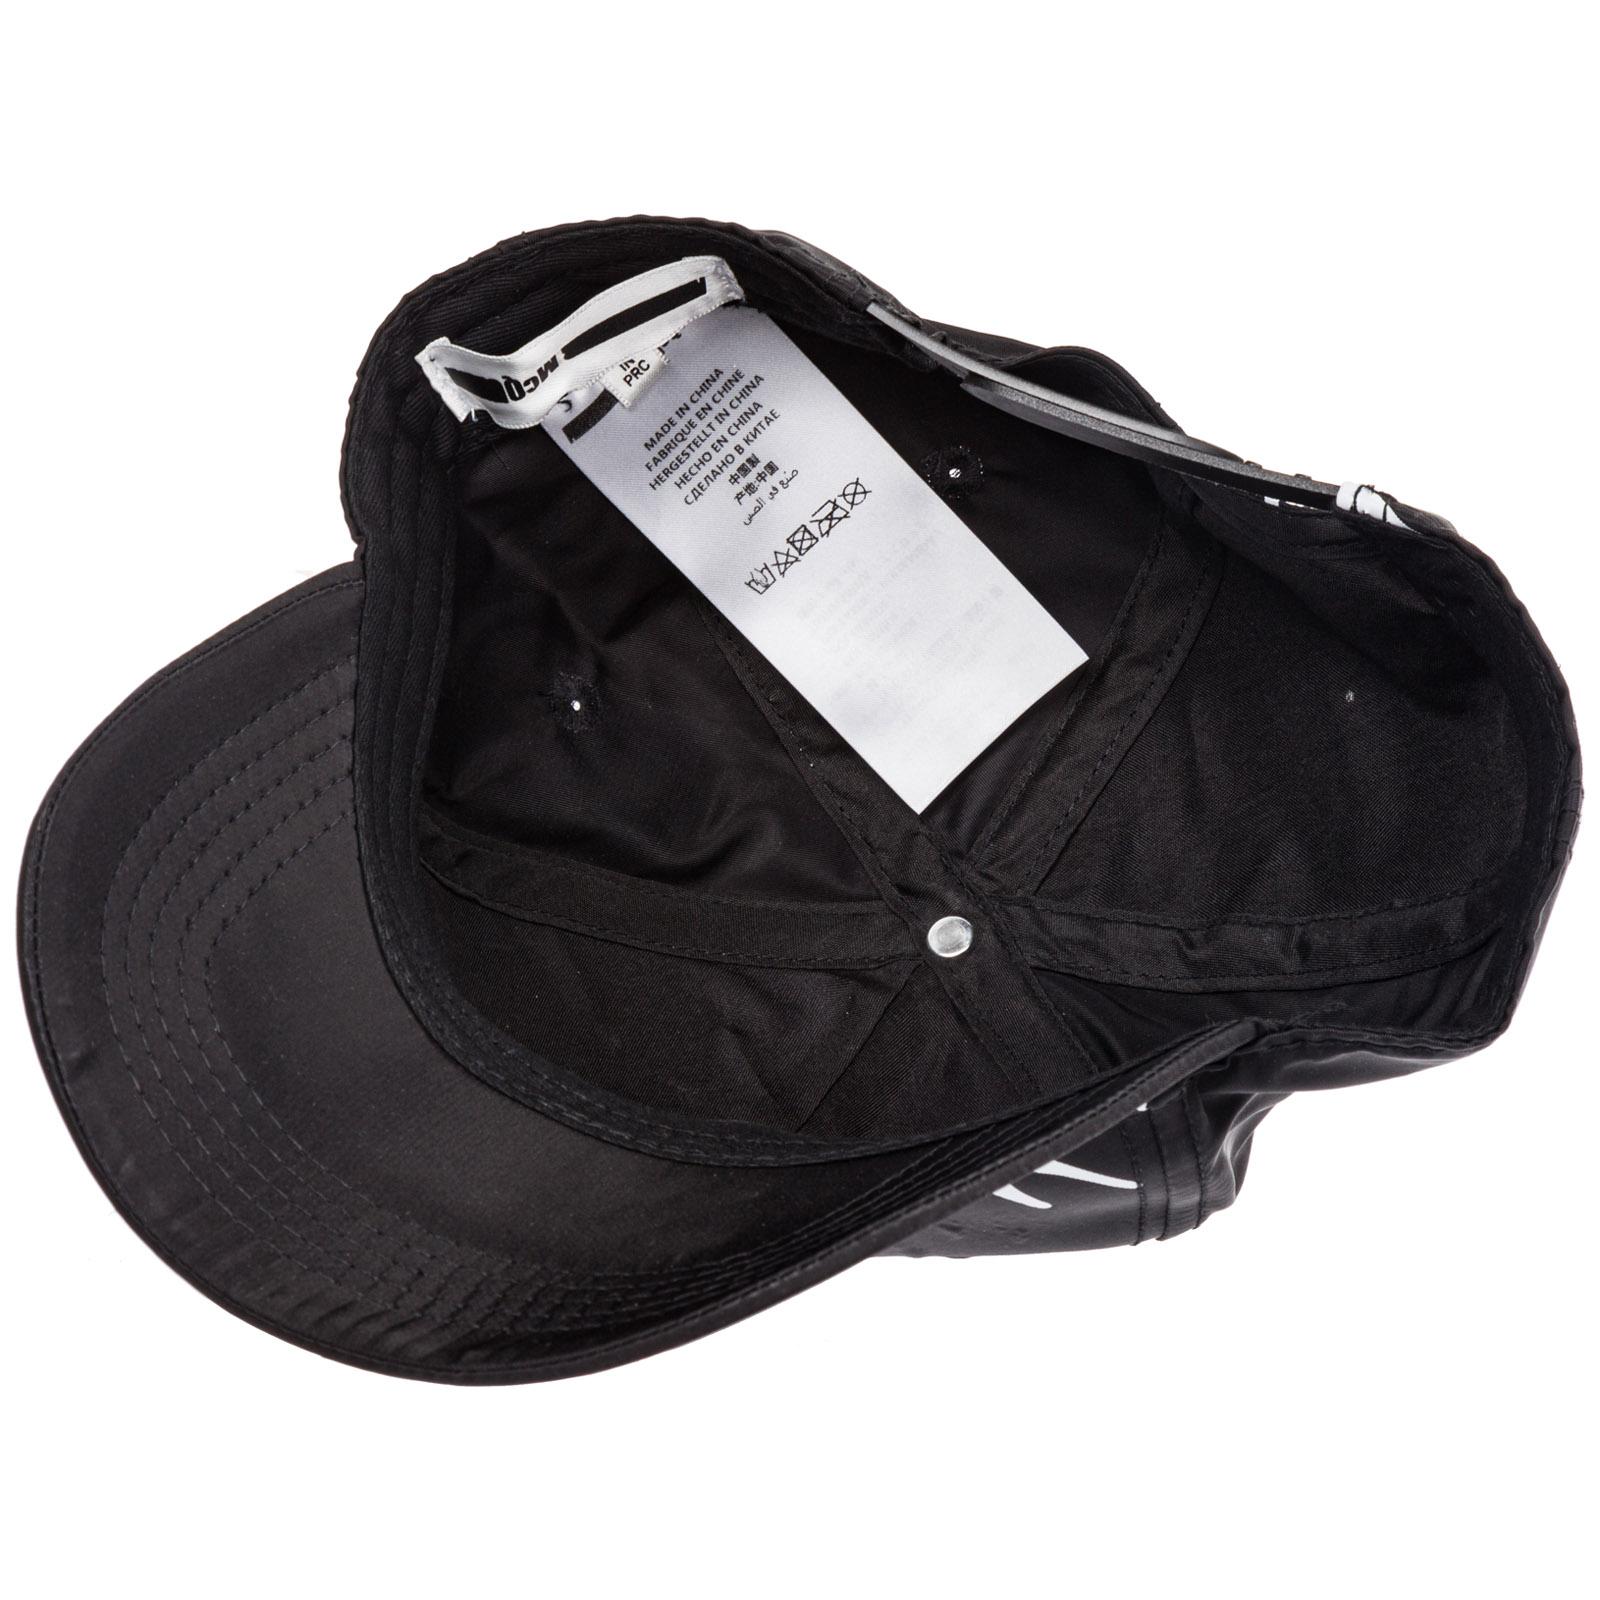 Adjustable men's hat baseball cap